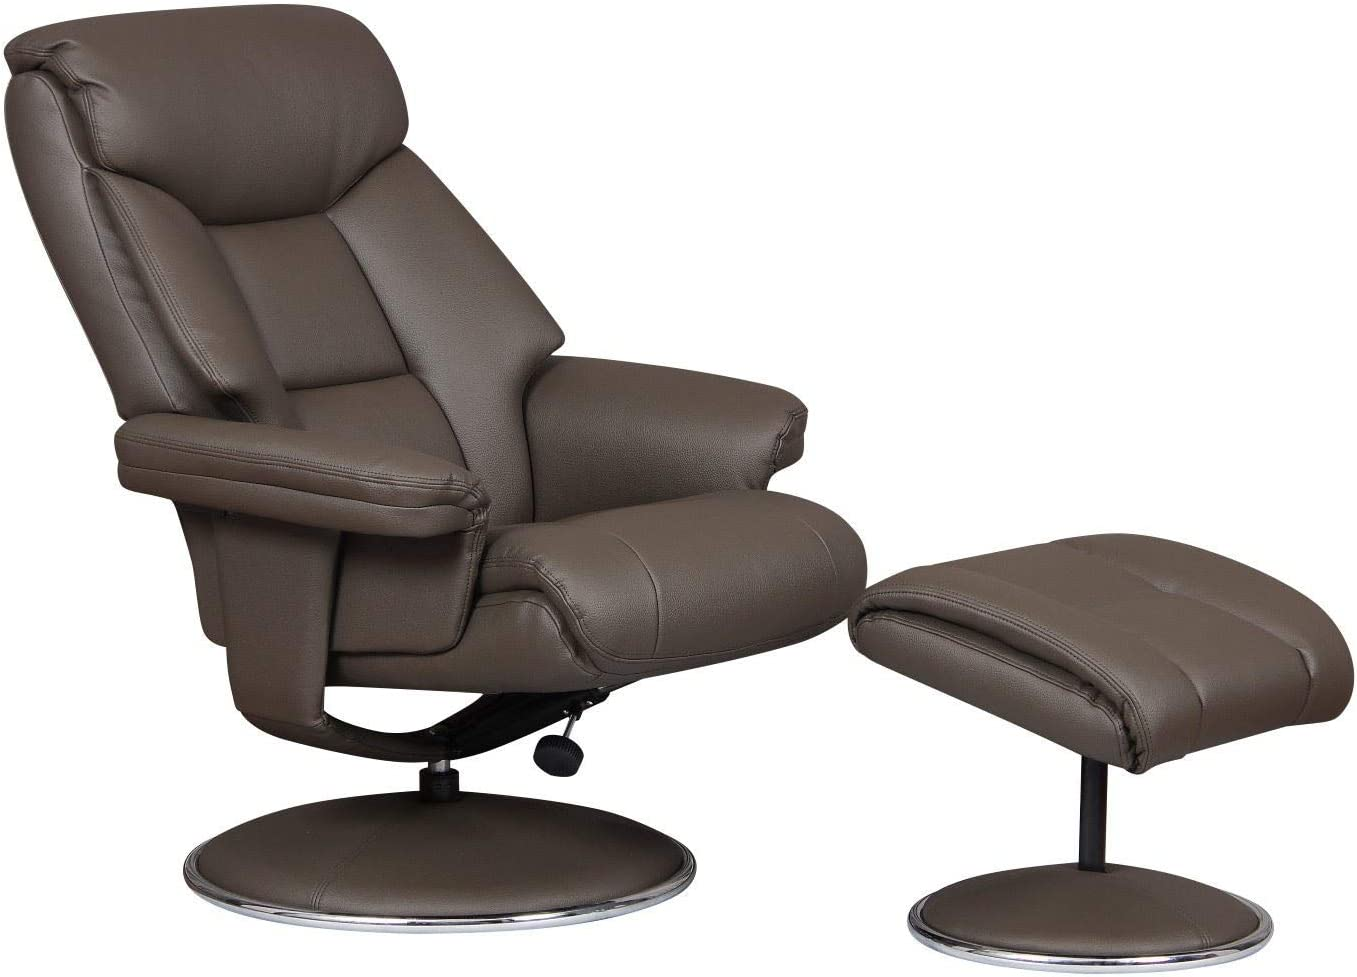 GFA Biarritz Plush Swivel Recliner Chair /& Matching Footstool In Charcoal//Chrome